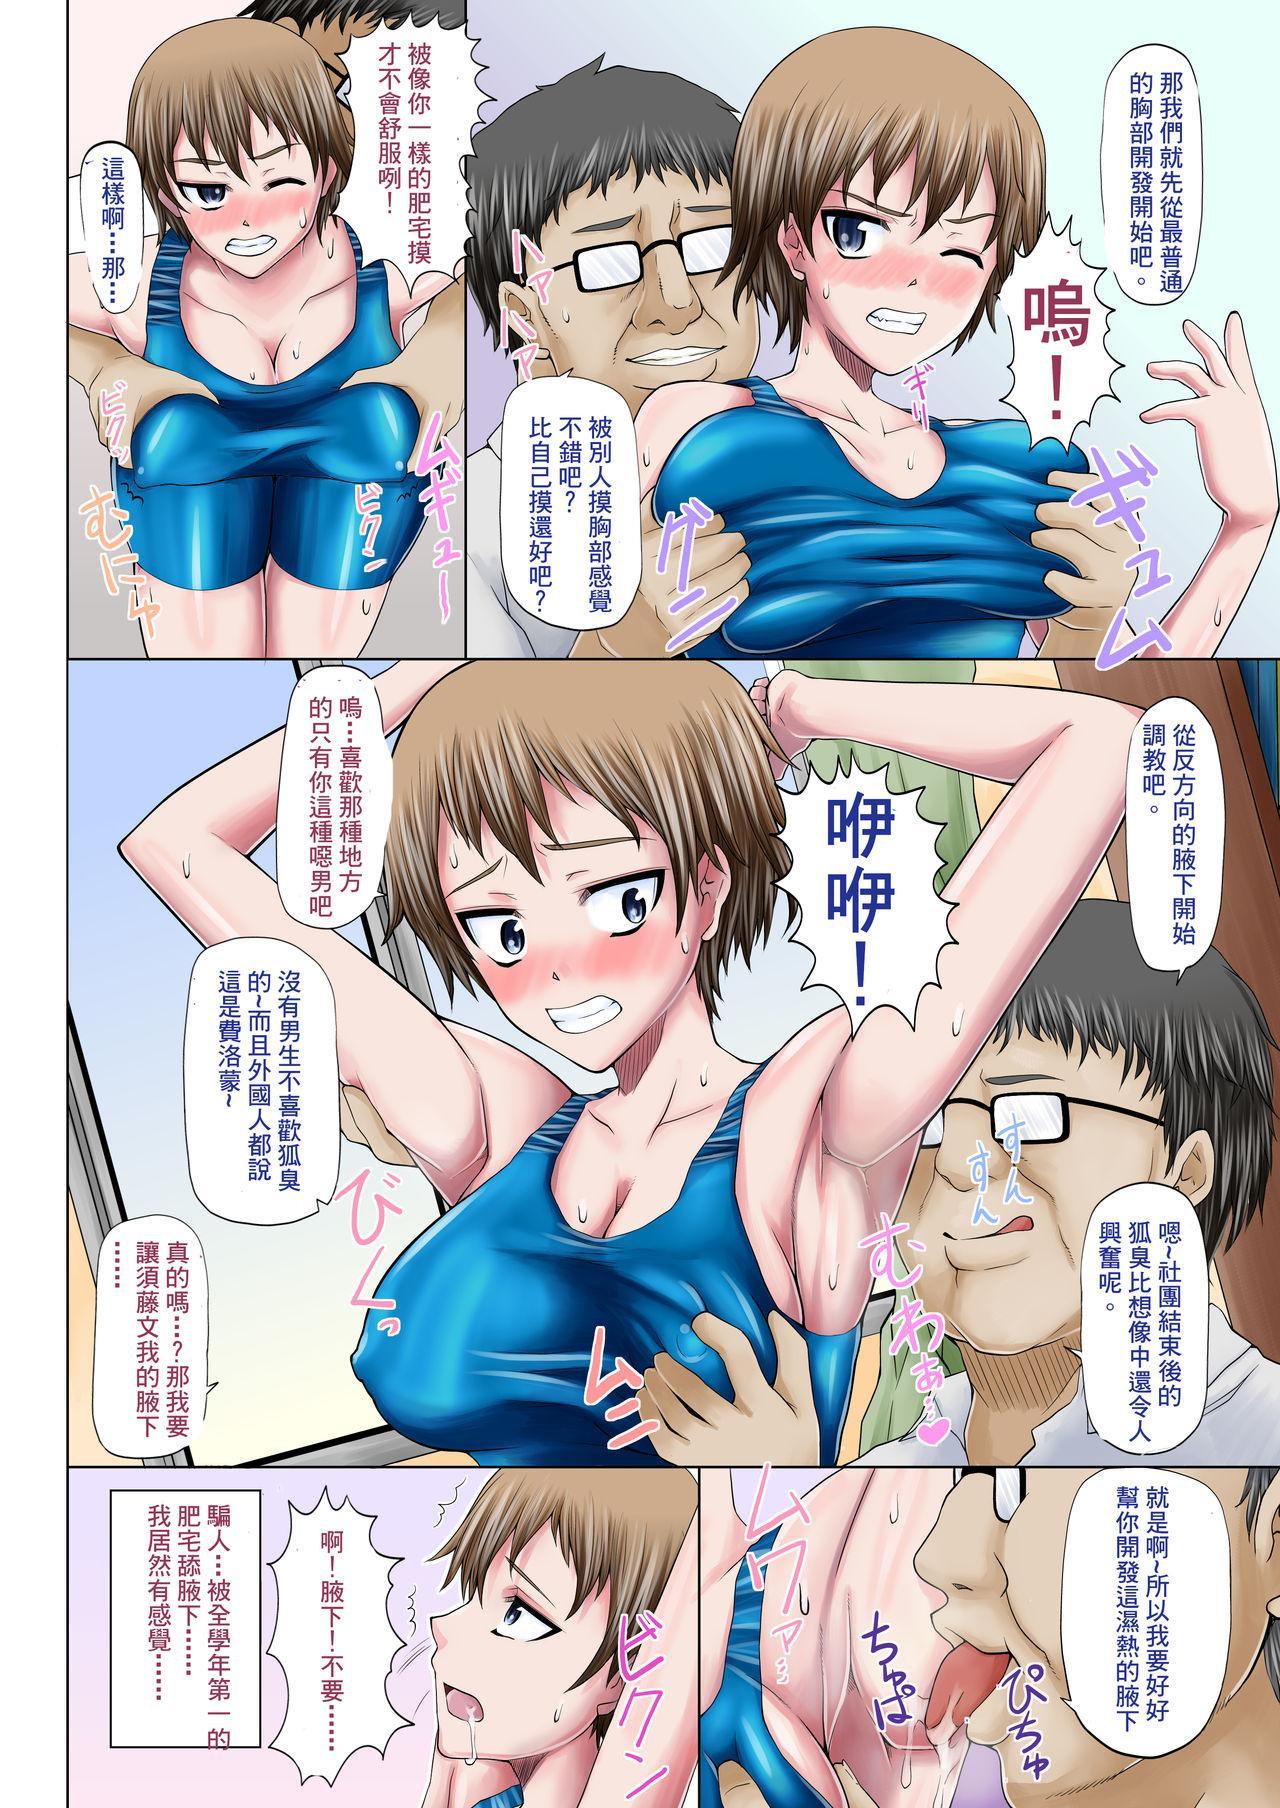 Netorare! Saimin! Kusurizuke! Kuroochi Bitch-ka Chronicle 1